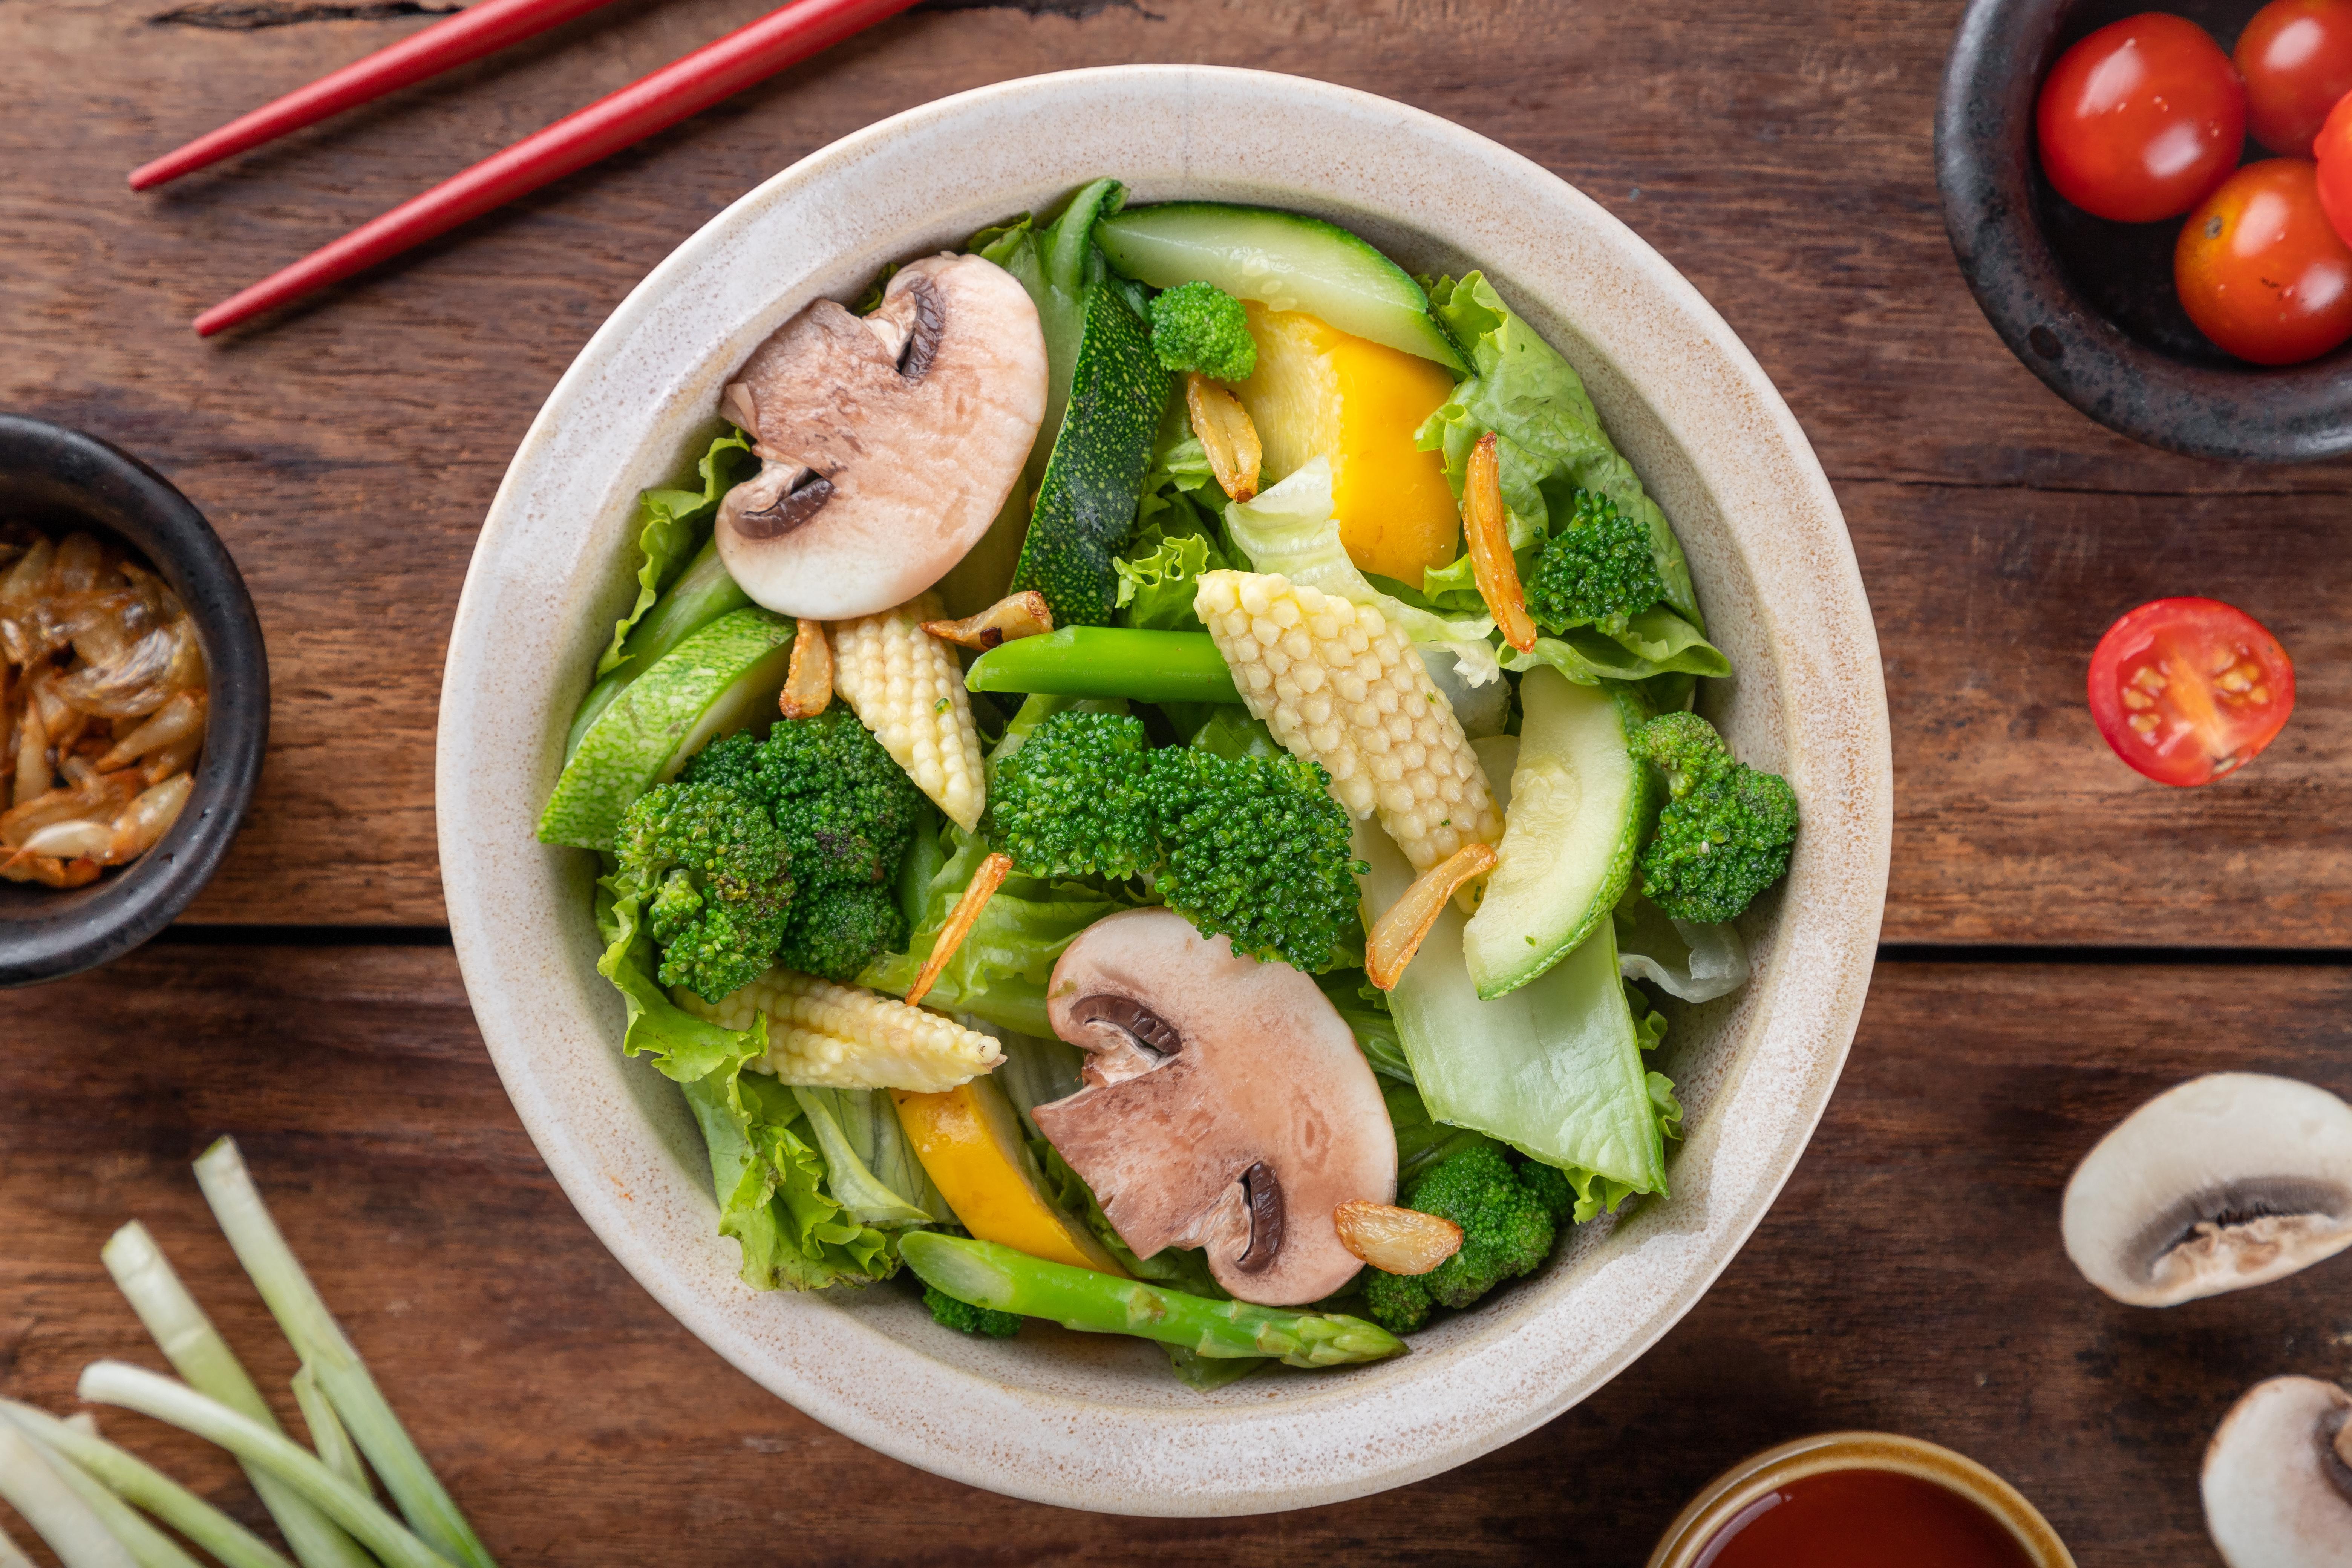 Stir Fry Greens with Waterchestnut